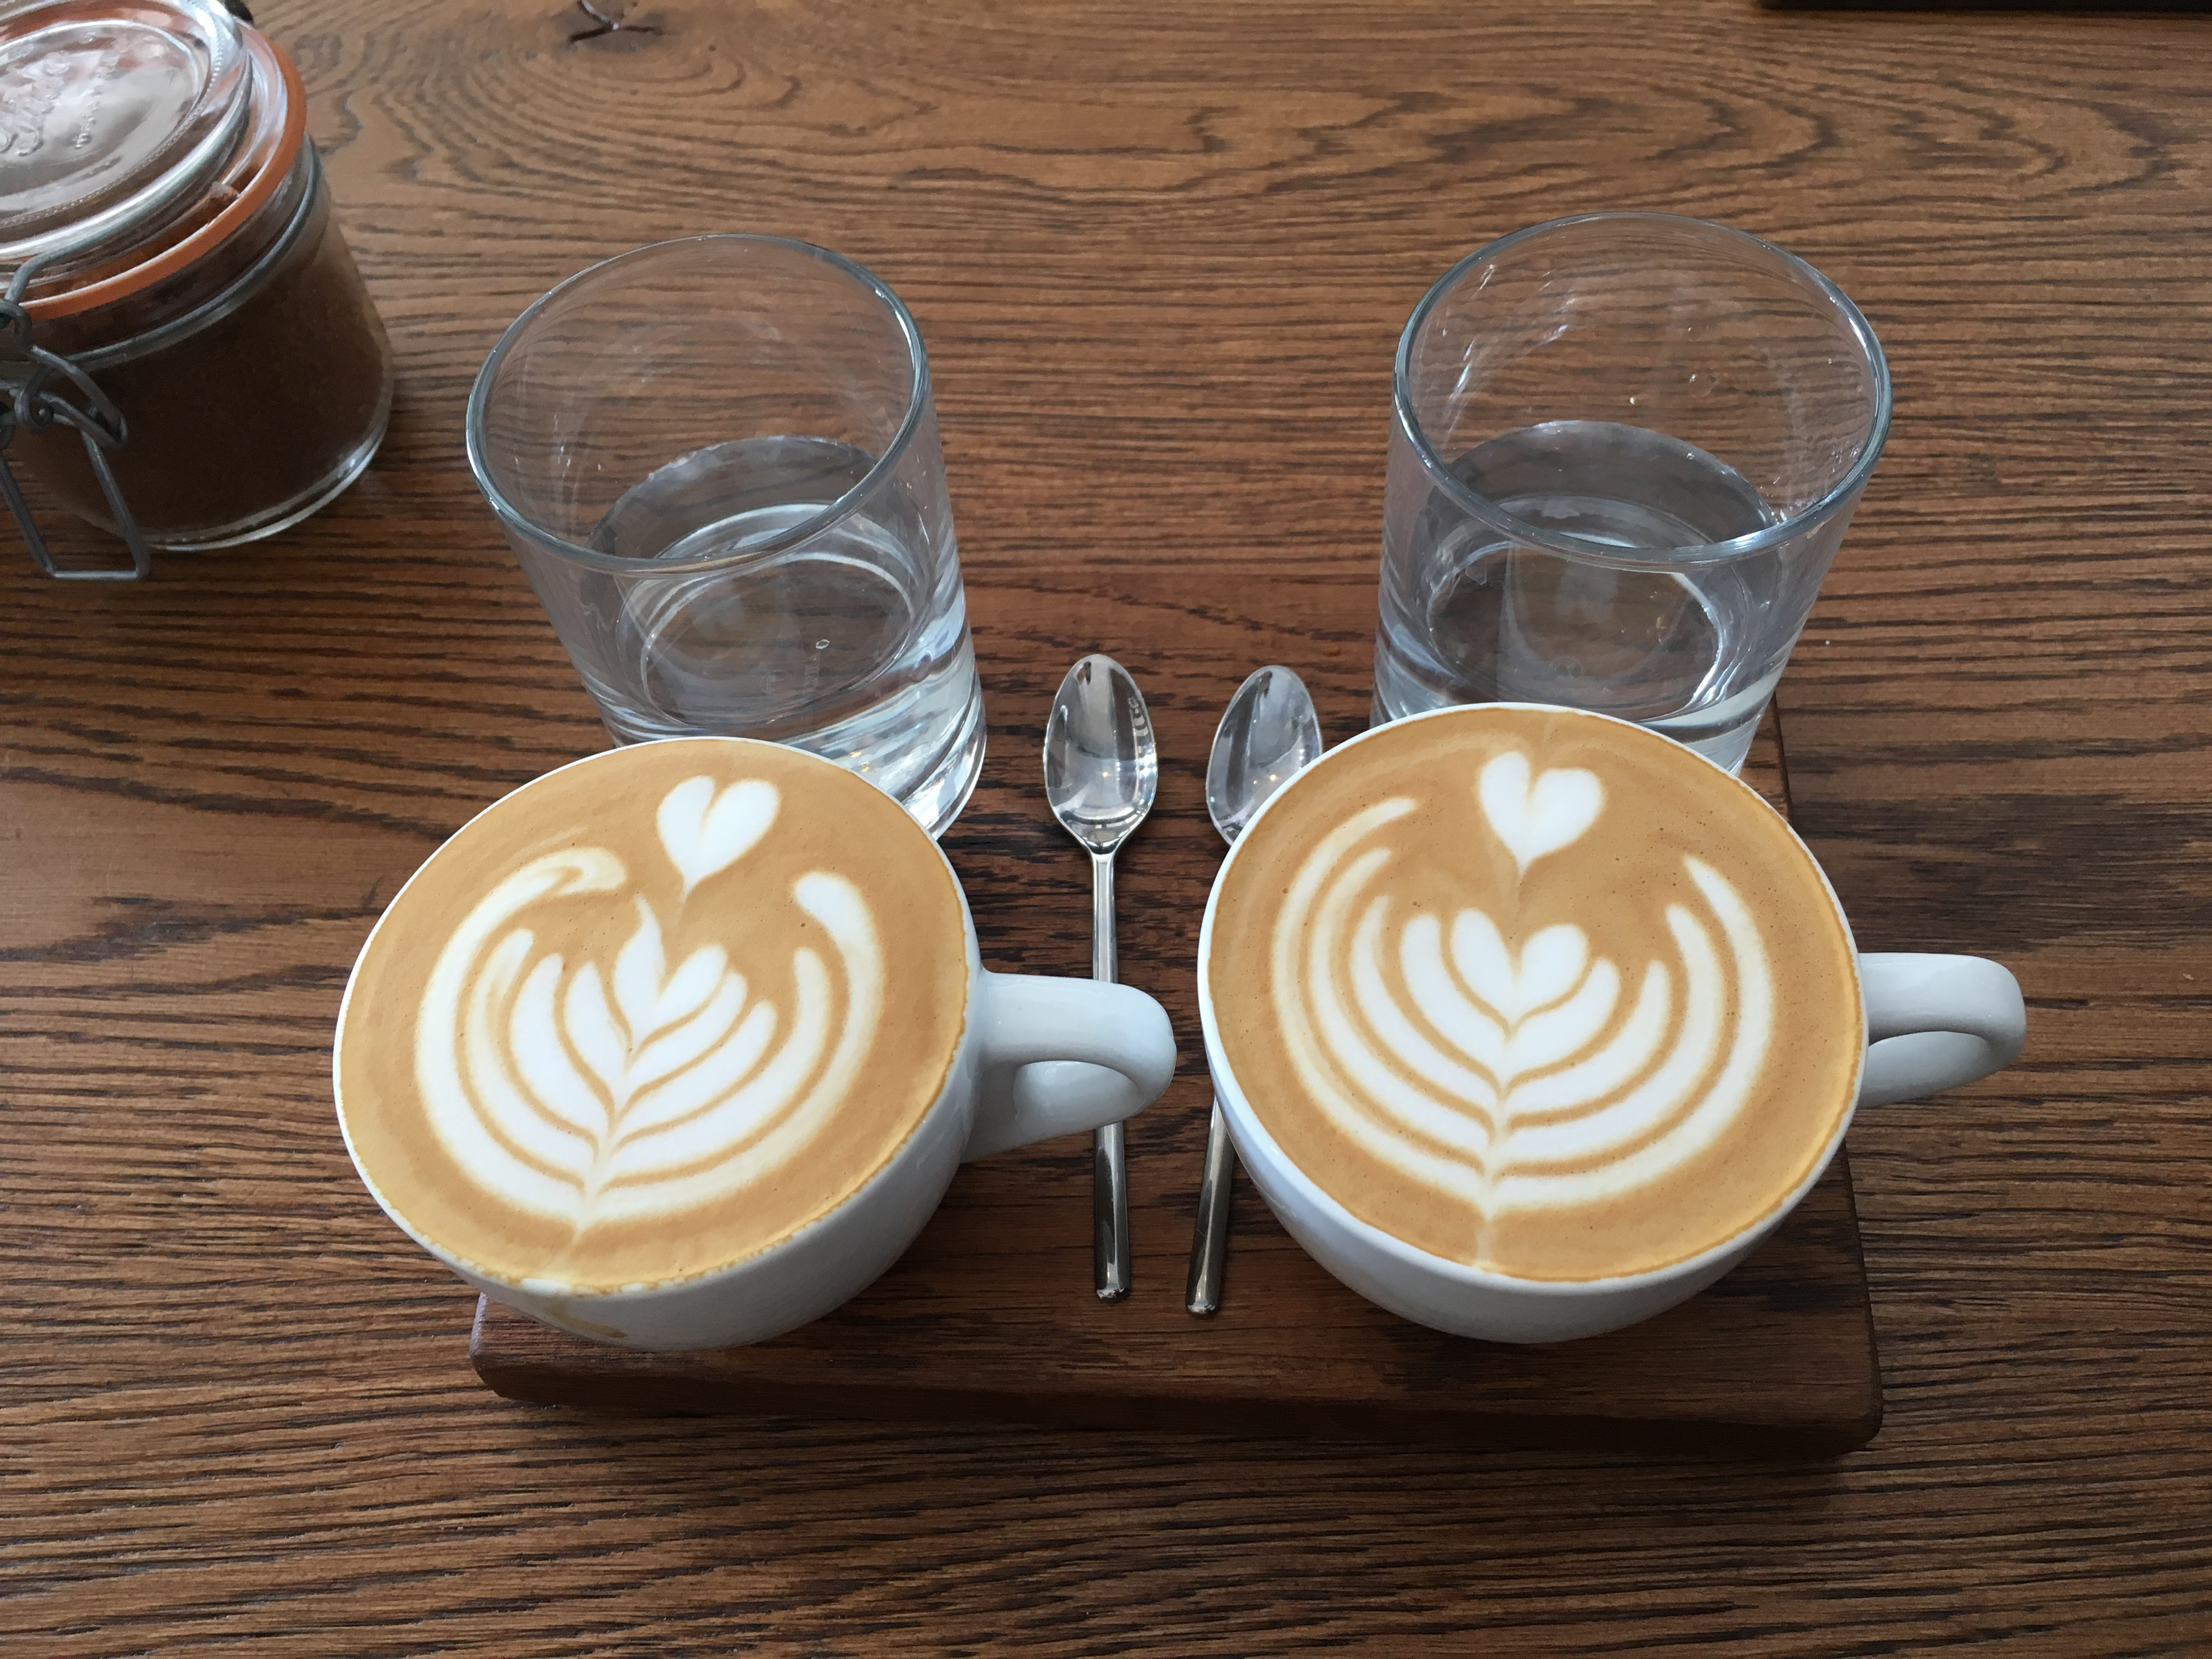 sakona coffee